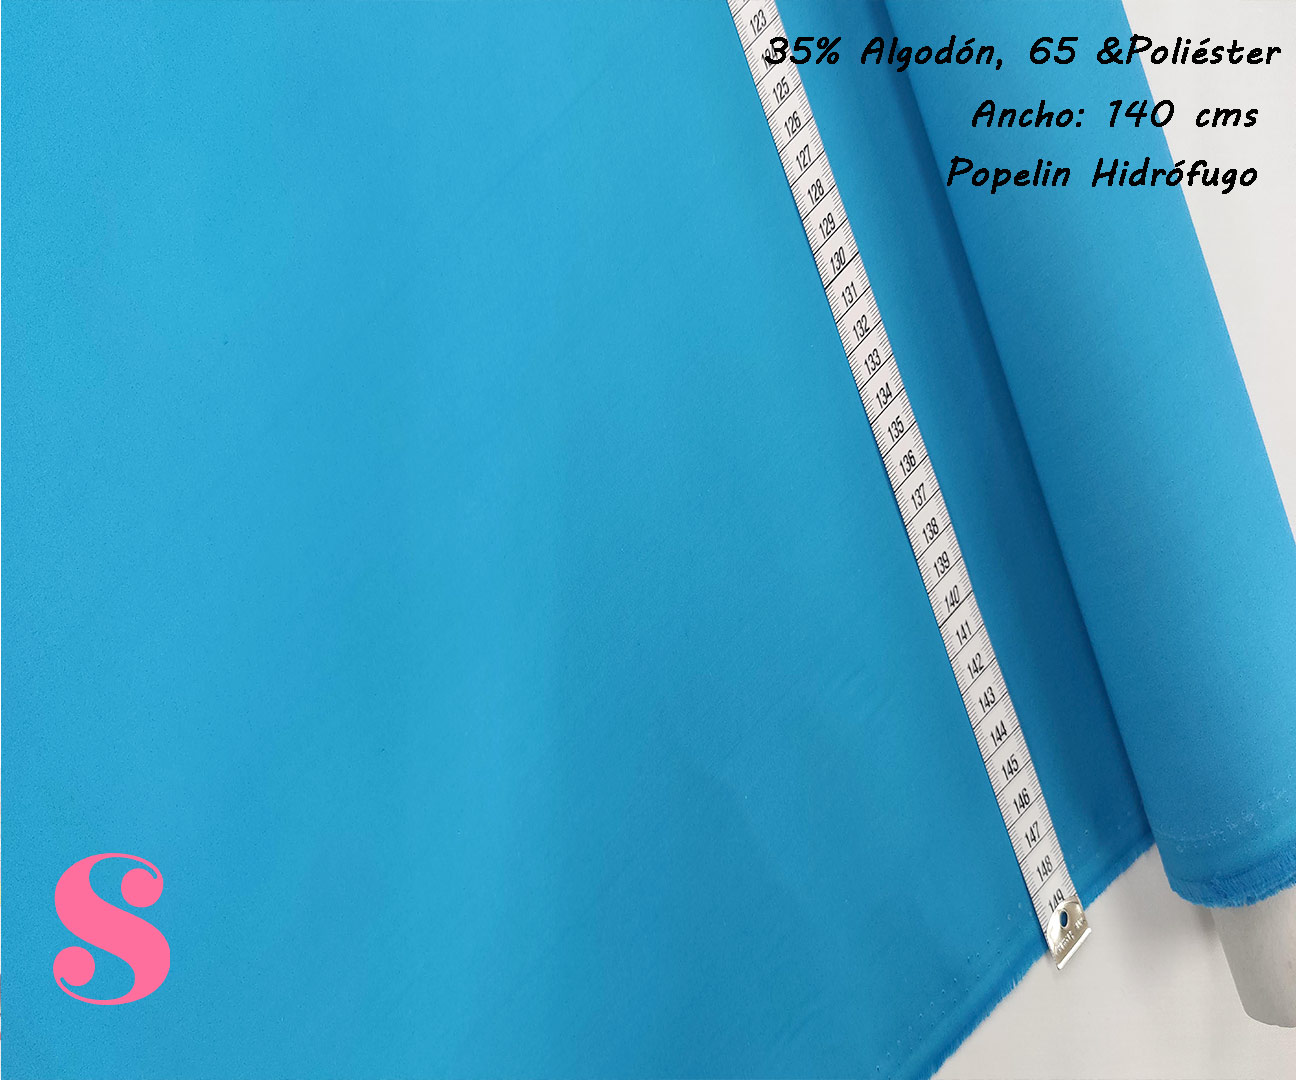 popelin-hidrofugo-antibacteriano-repelente-impermeable,Popelín Hidrófugo Antibacteriano Azul